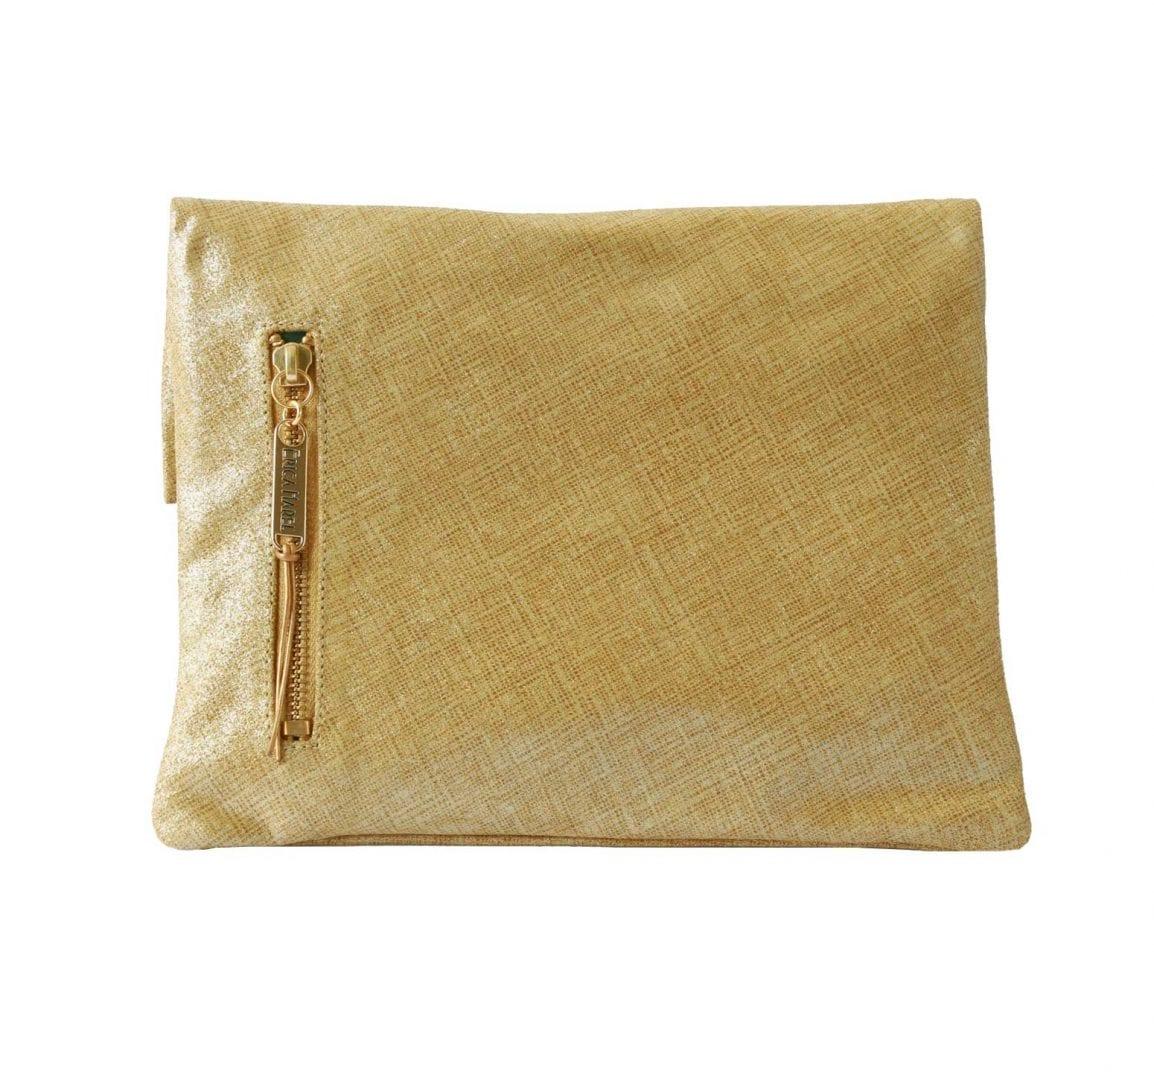 Italian Gold Chain >> Metallic Gold Leather Clutch Bag   Versatile 4-way Bag   Erica Harel